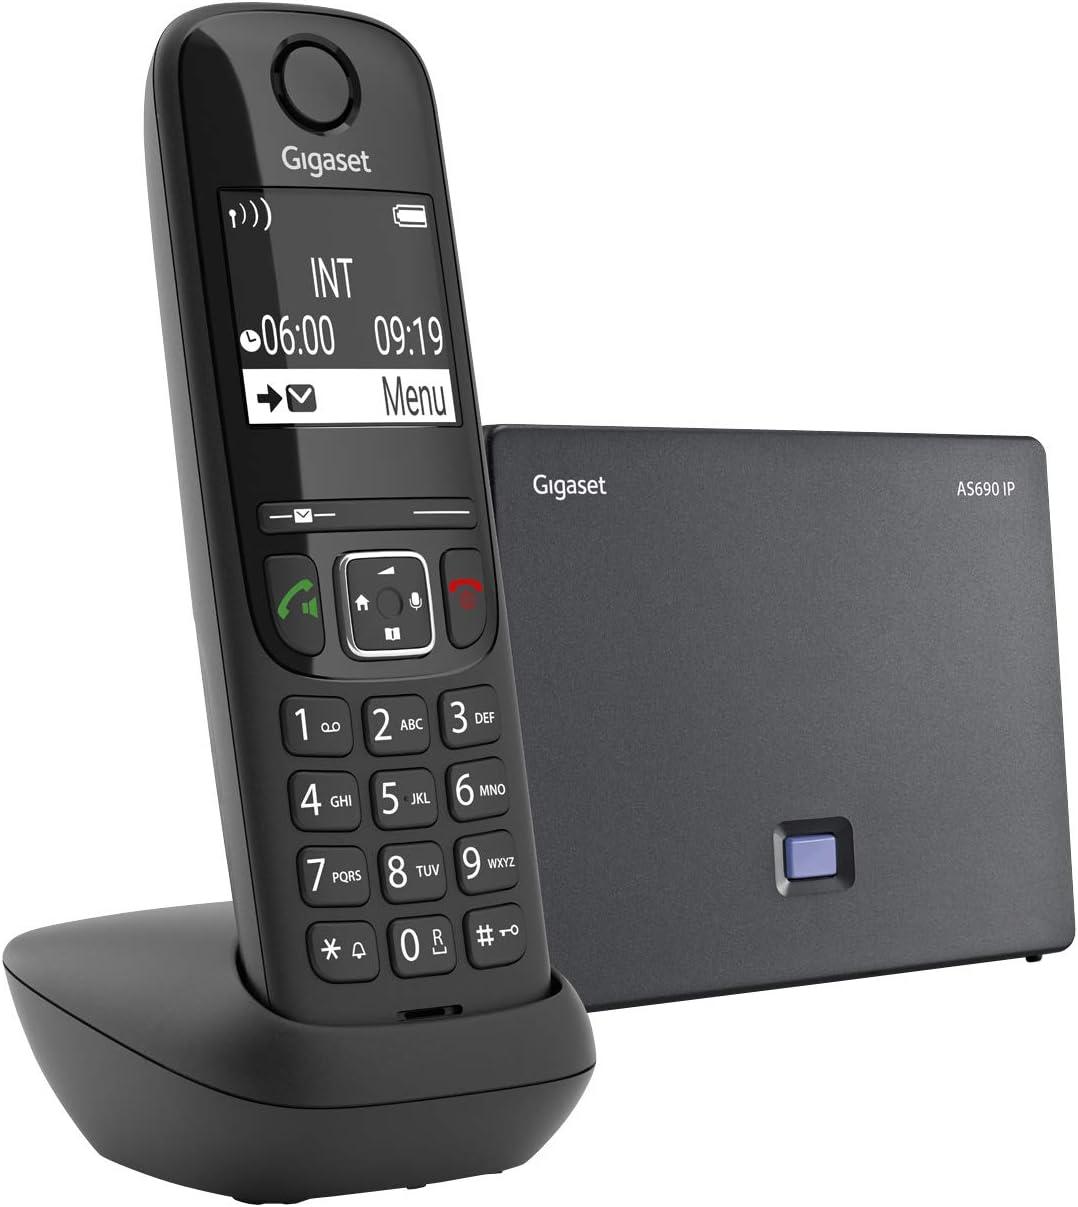 GIGASET COMMUNICATIONS ITALIA INALÁMBRICO 2 VOIPe431 Anal. A540IP AS690IPBLACK: Amazon.es: Electrónica